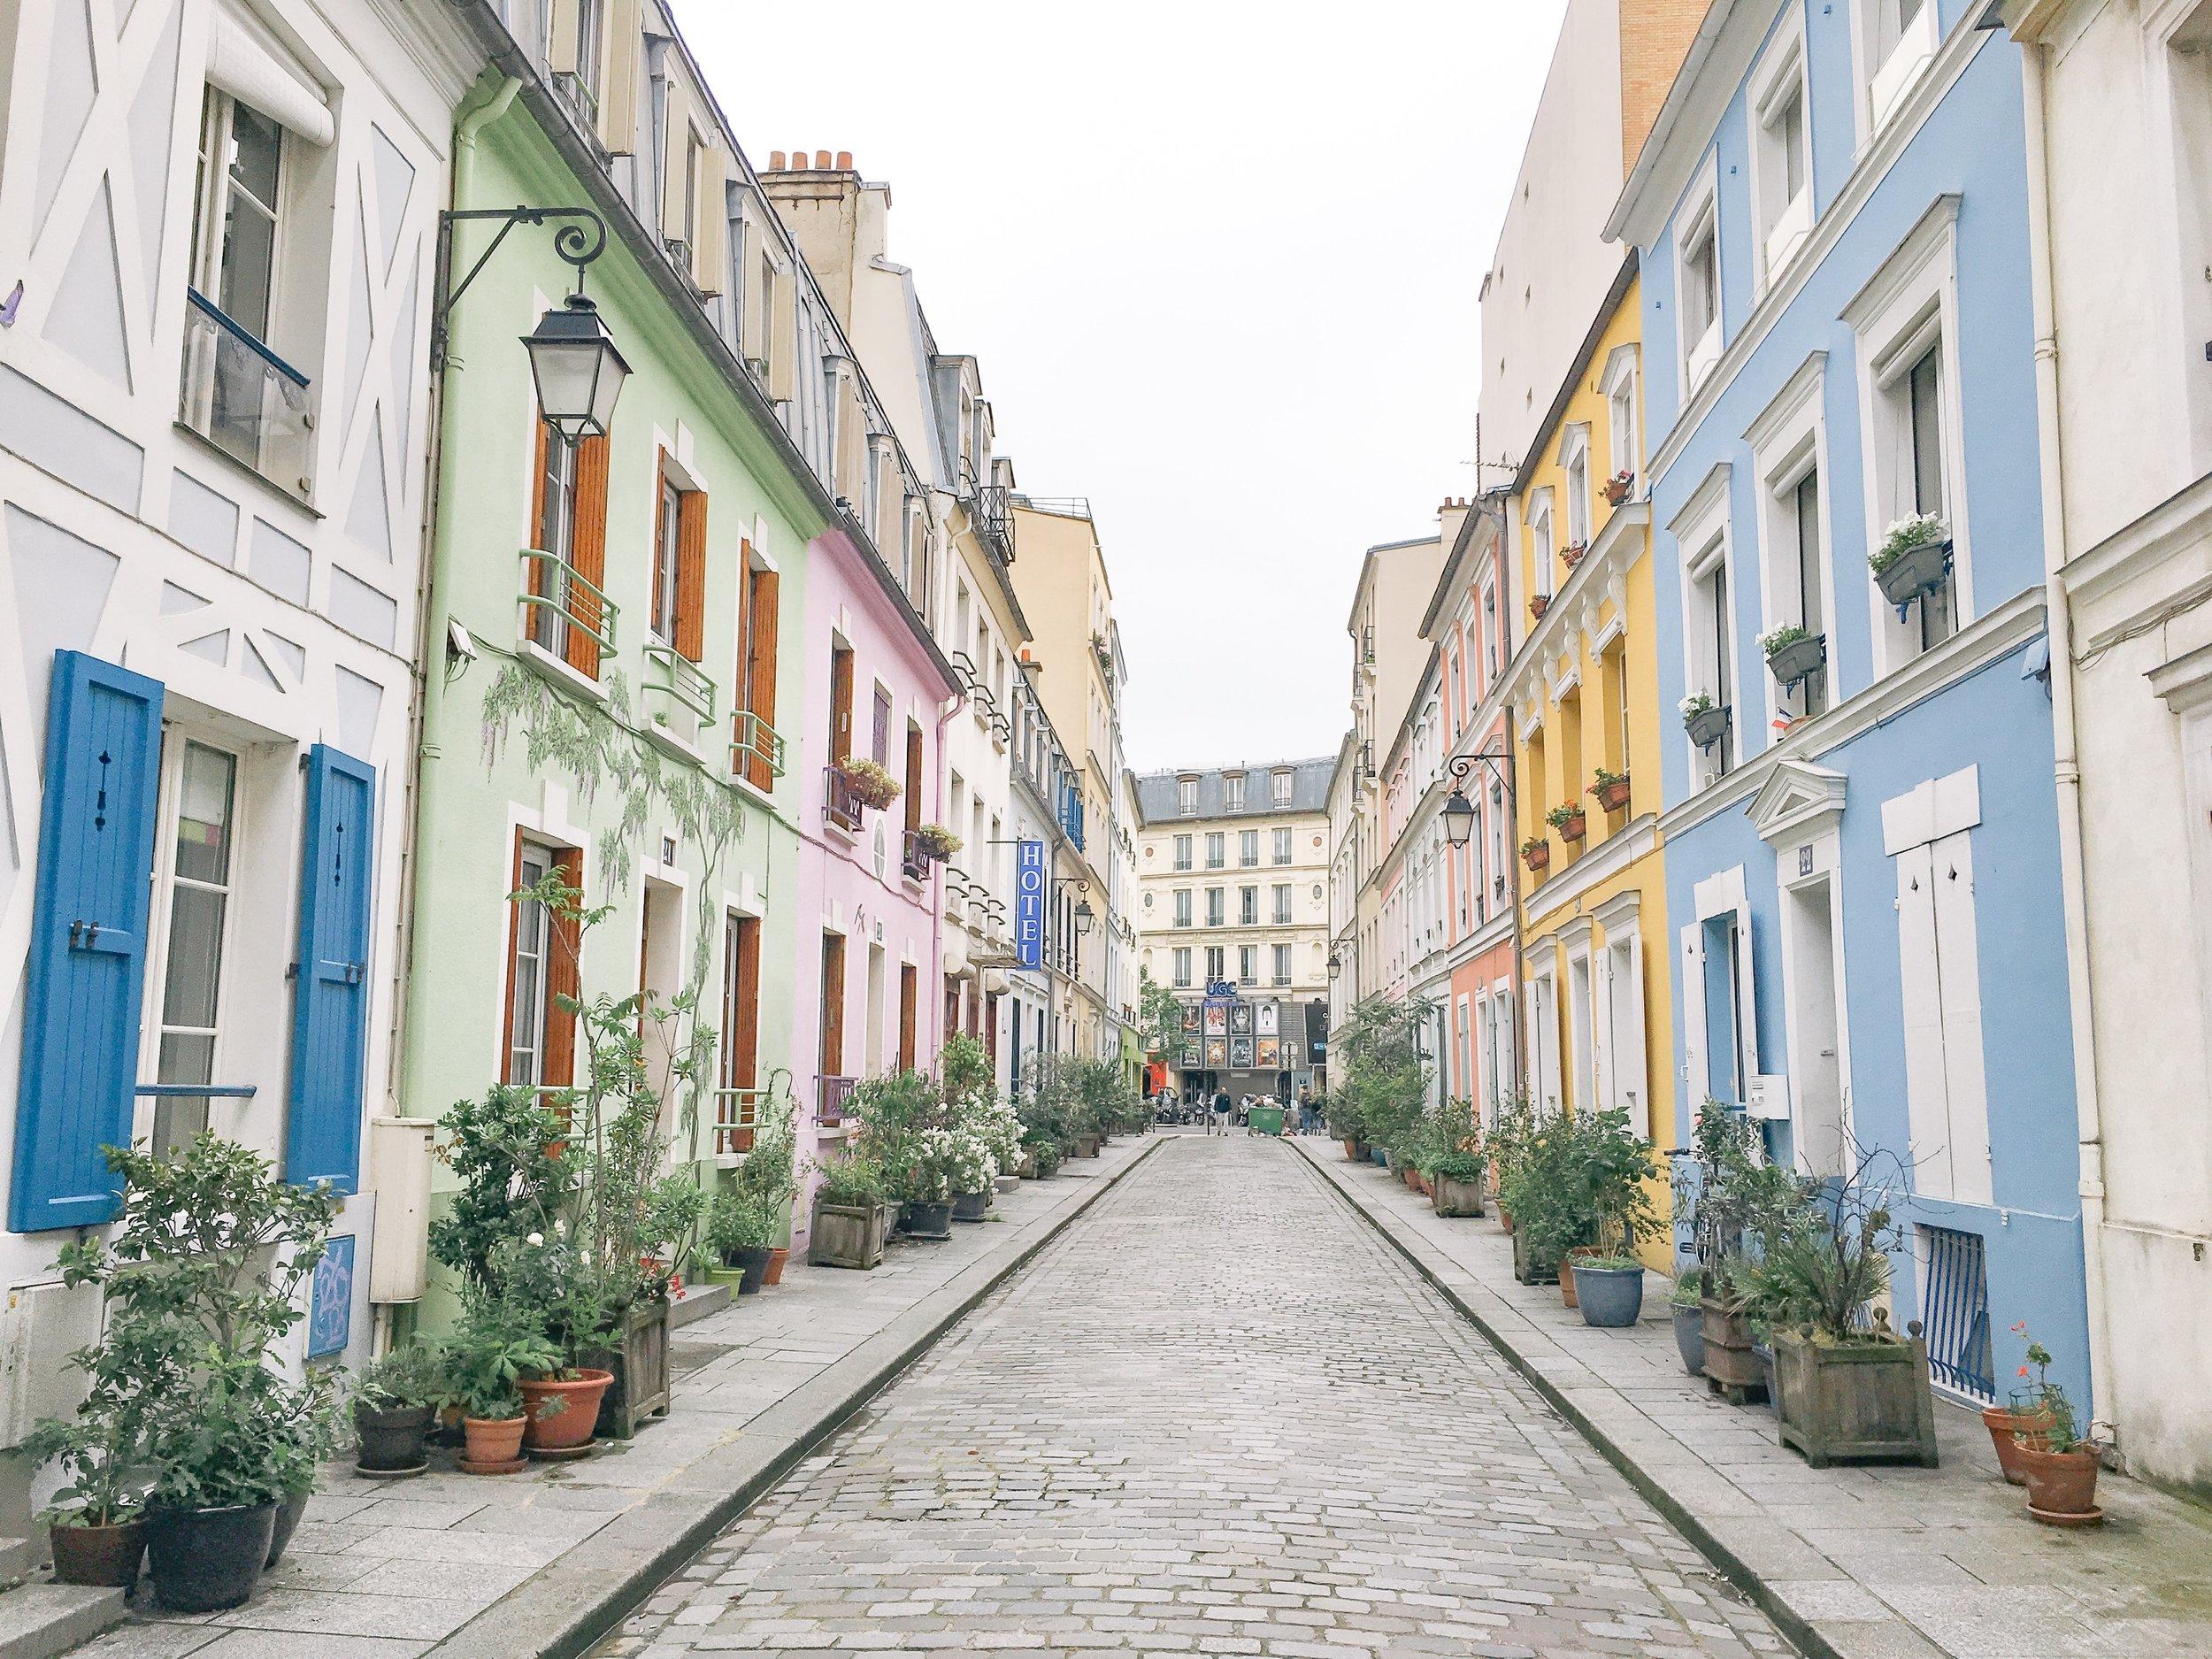 Paris-Walking-Guide-MonicaFrancis-11.jpeg